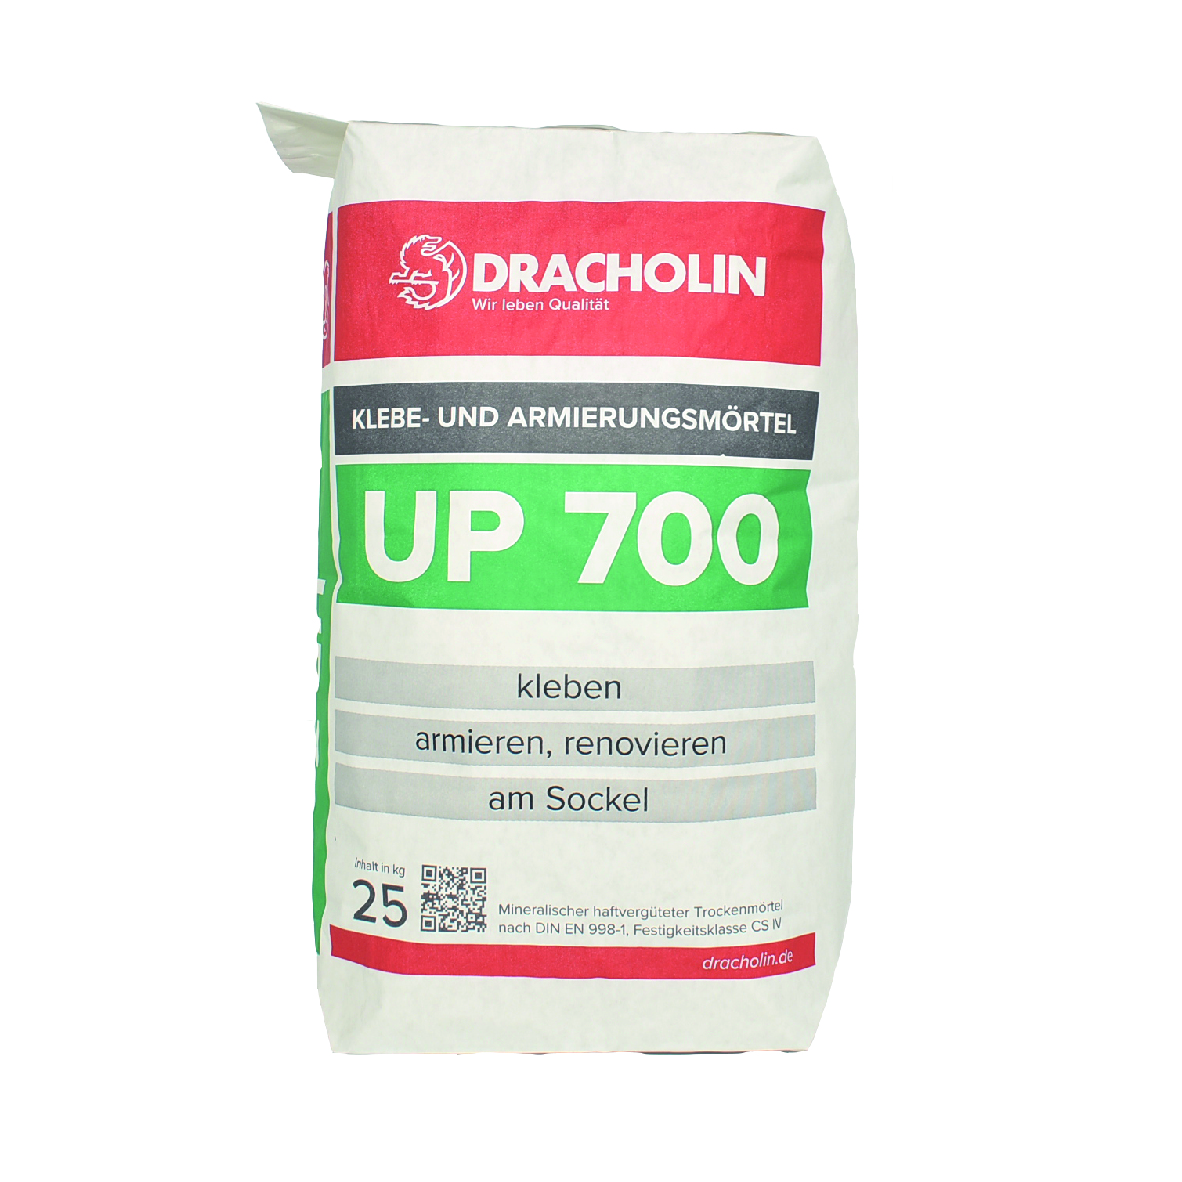 Dracholin UP 700 Sockelputz